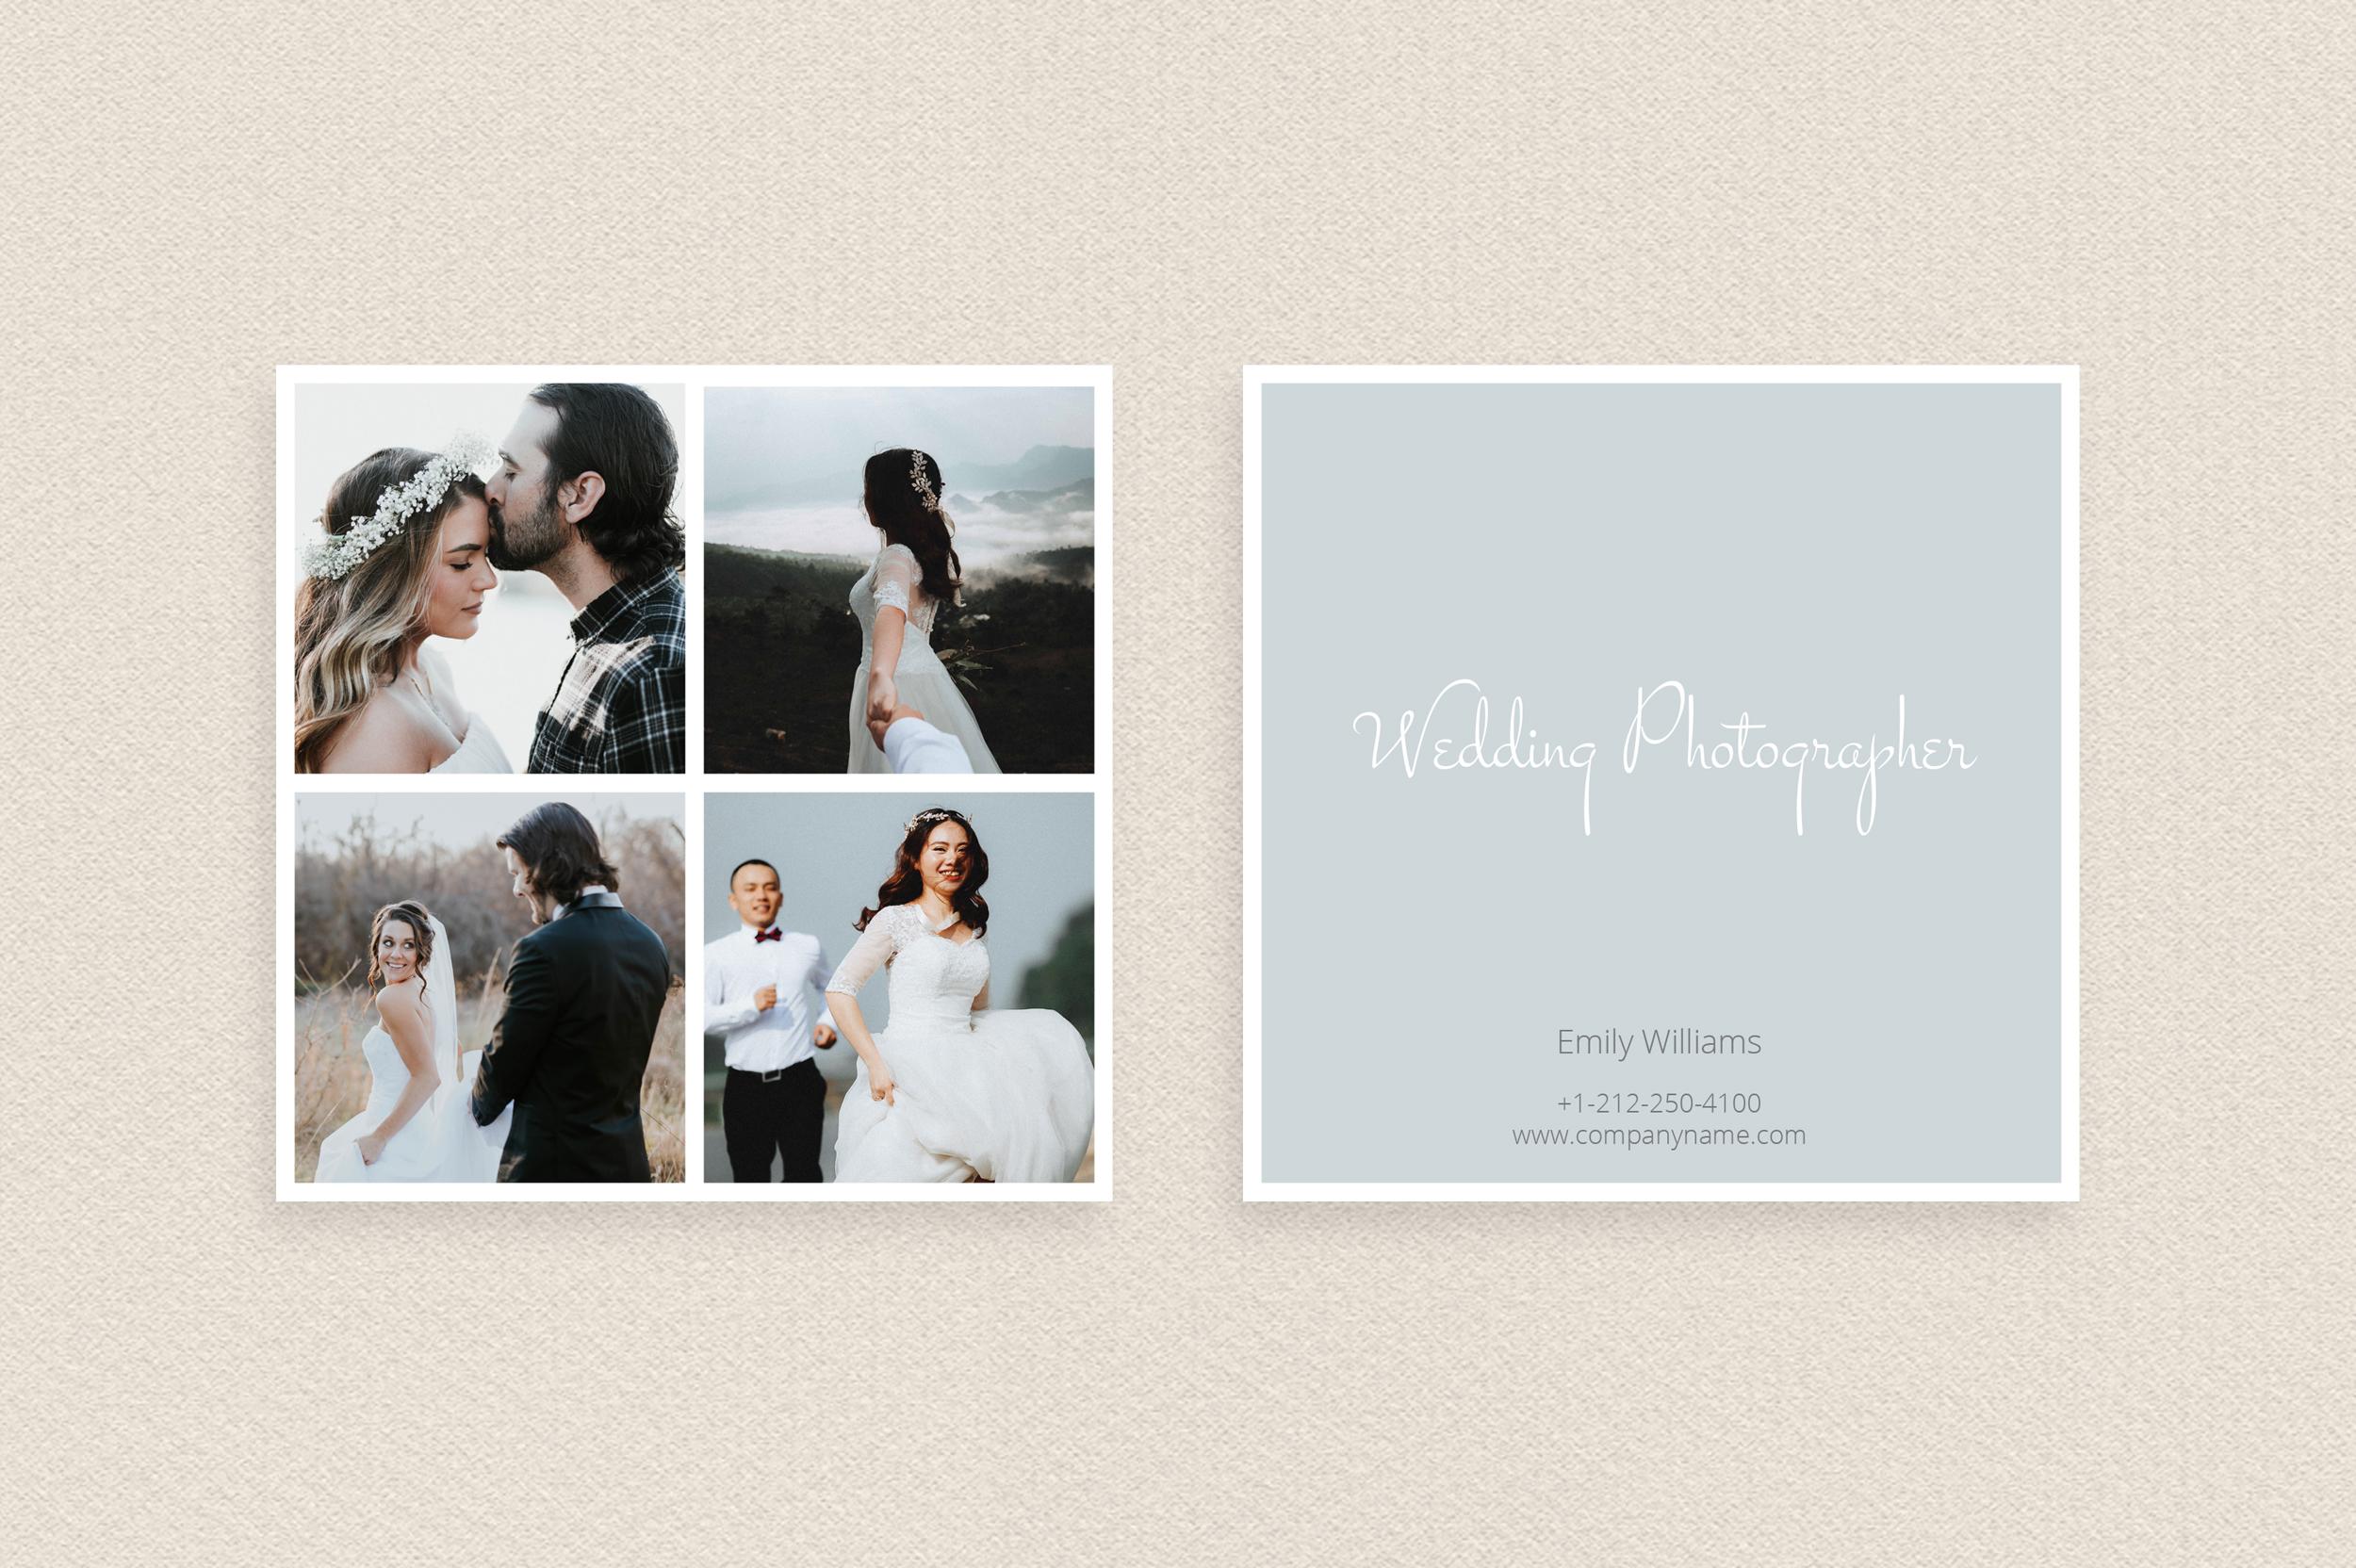 Square polaroid wedding photographer bu design bundles square polaroid wedding photographer business card example image 2 colourmoves